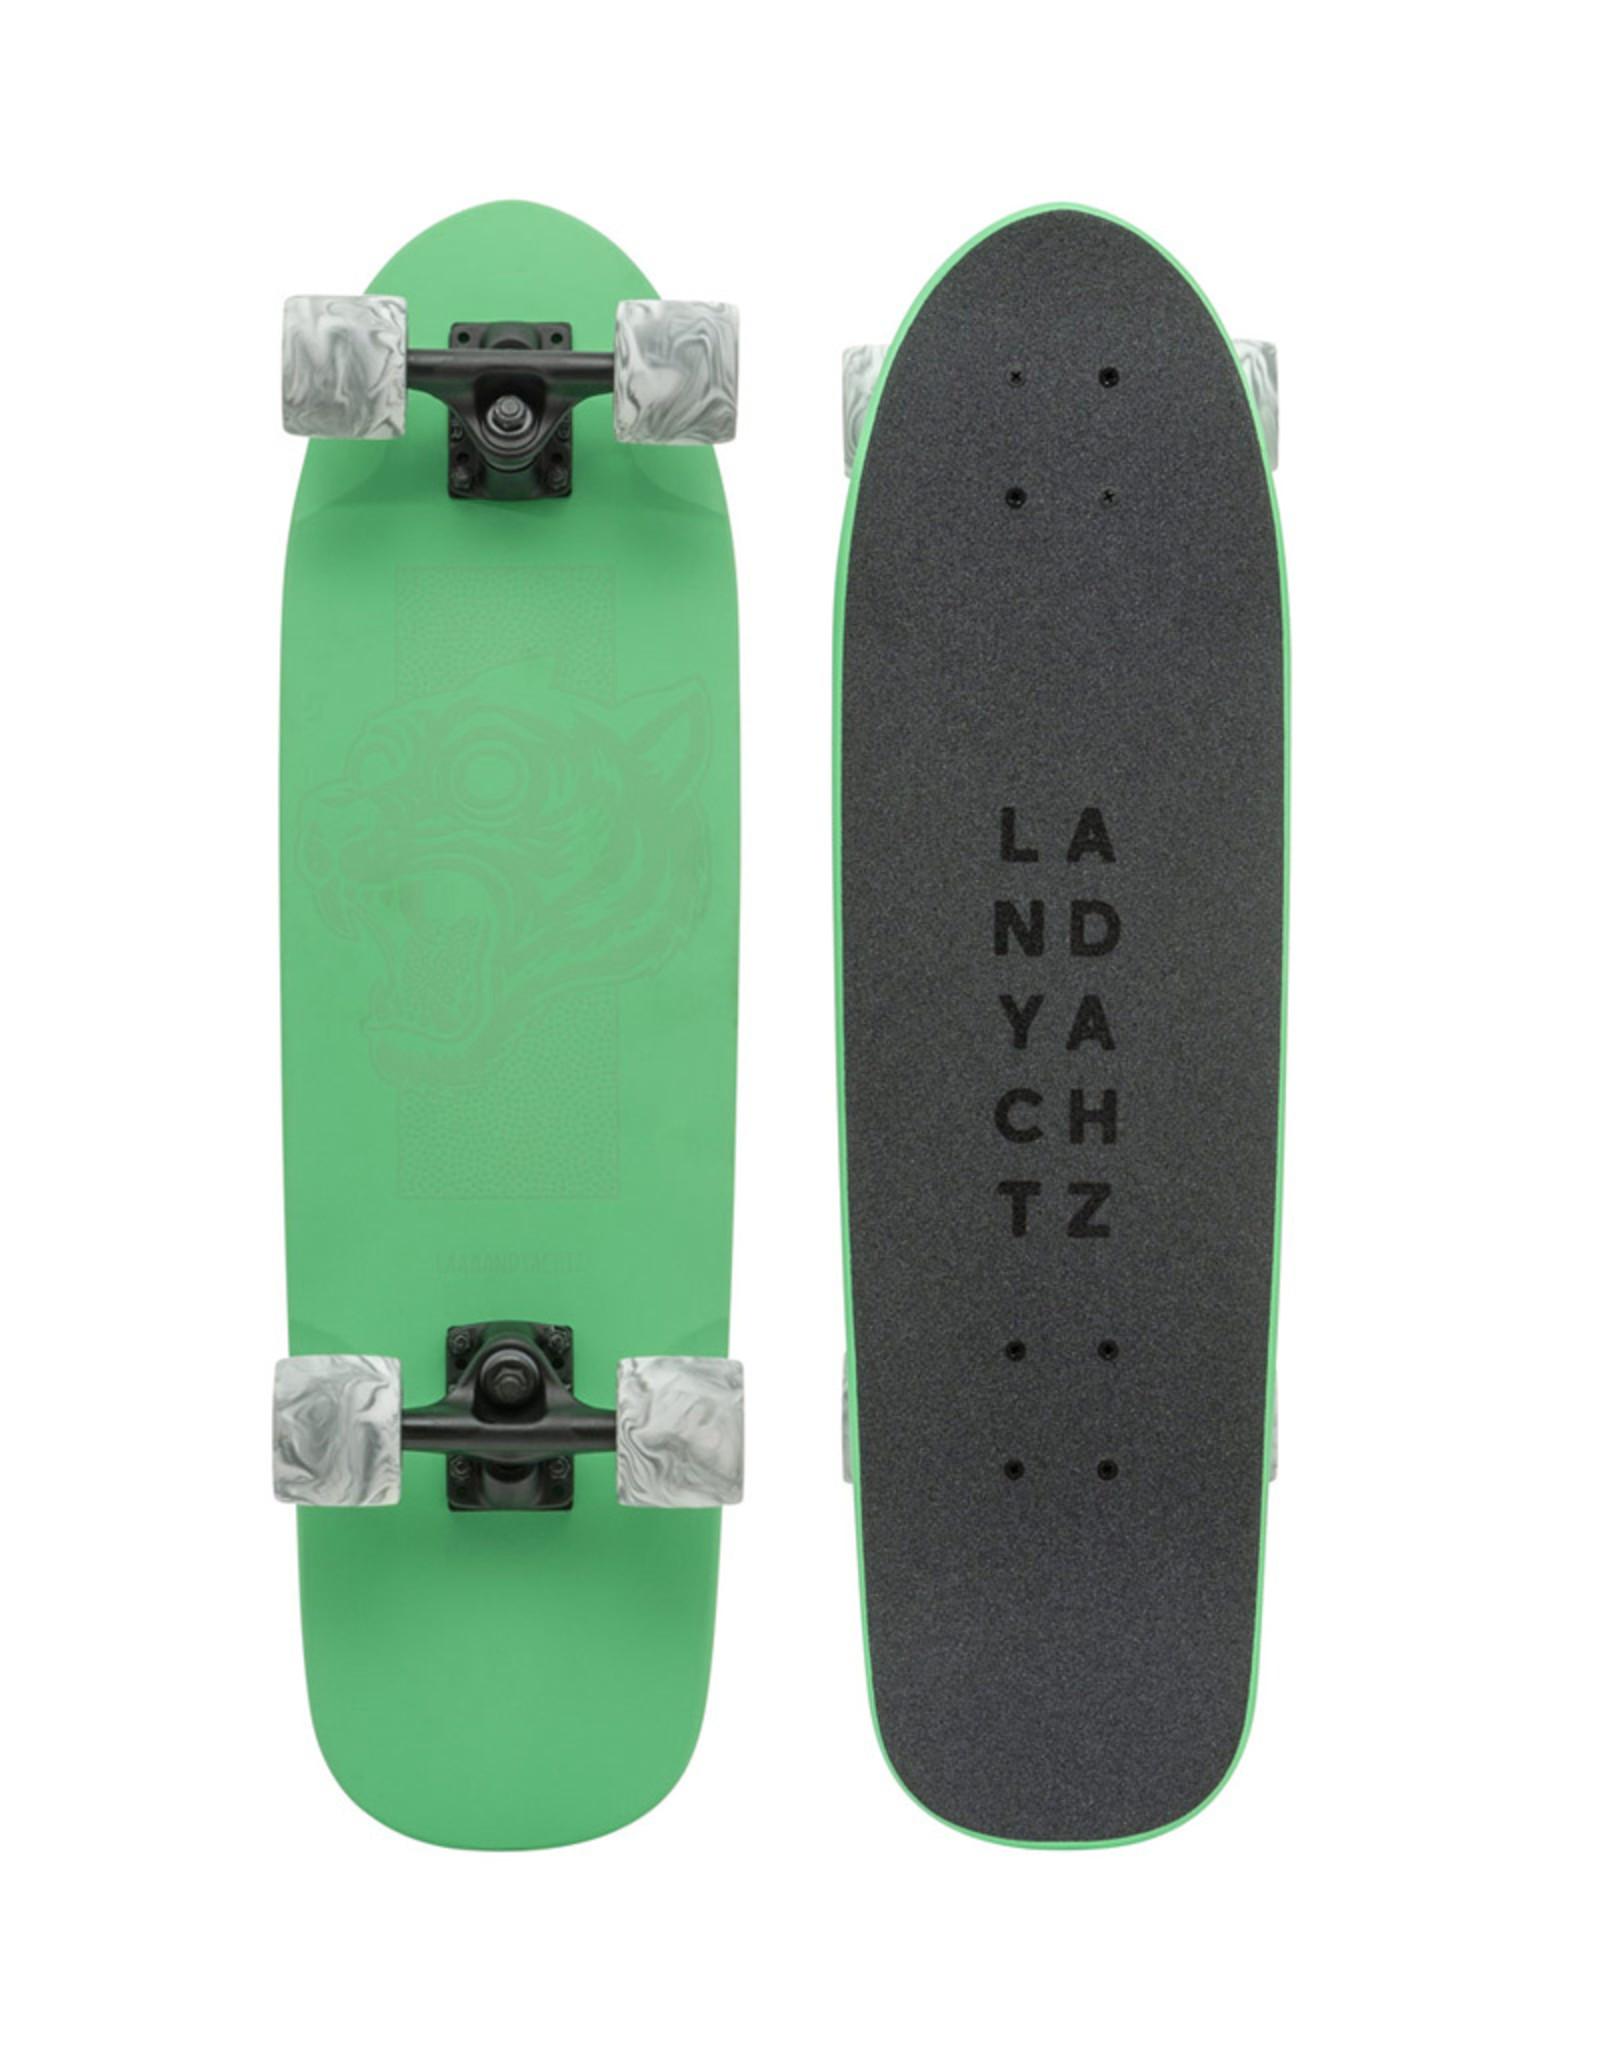 "Landyachtz Landyachtz Dinghy 28.5"" Green Tiger Complete"